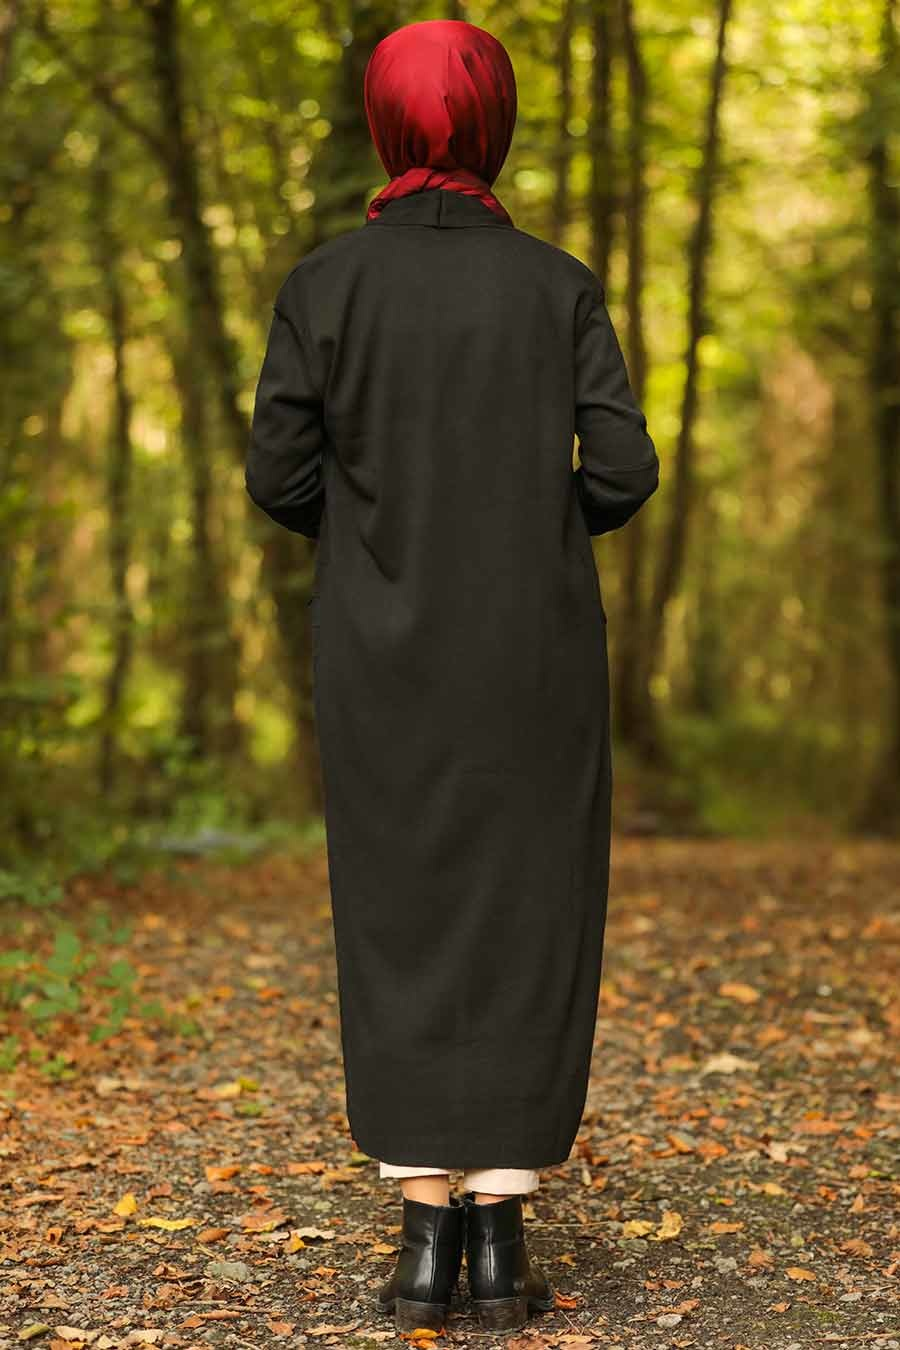 Neva Style - Black Hijab Knitwear Cardigan 15691S